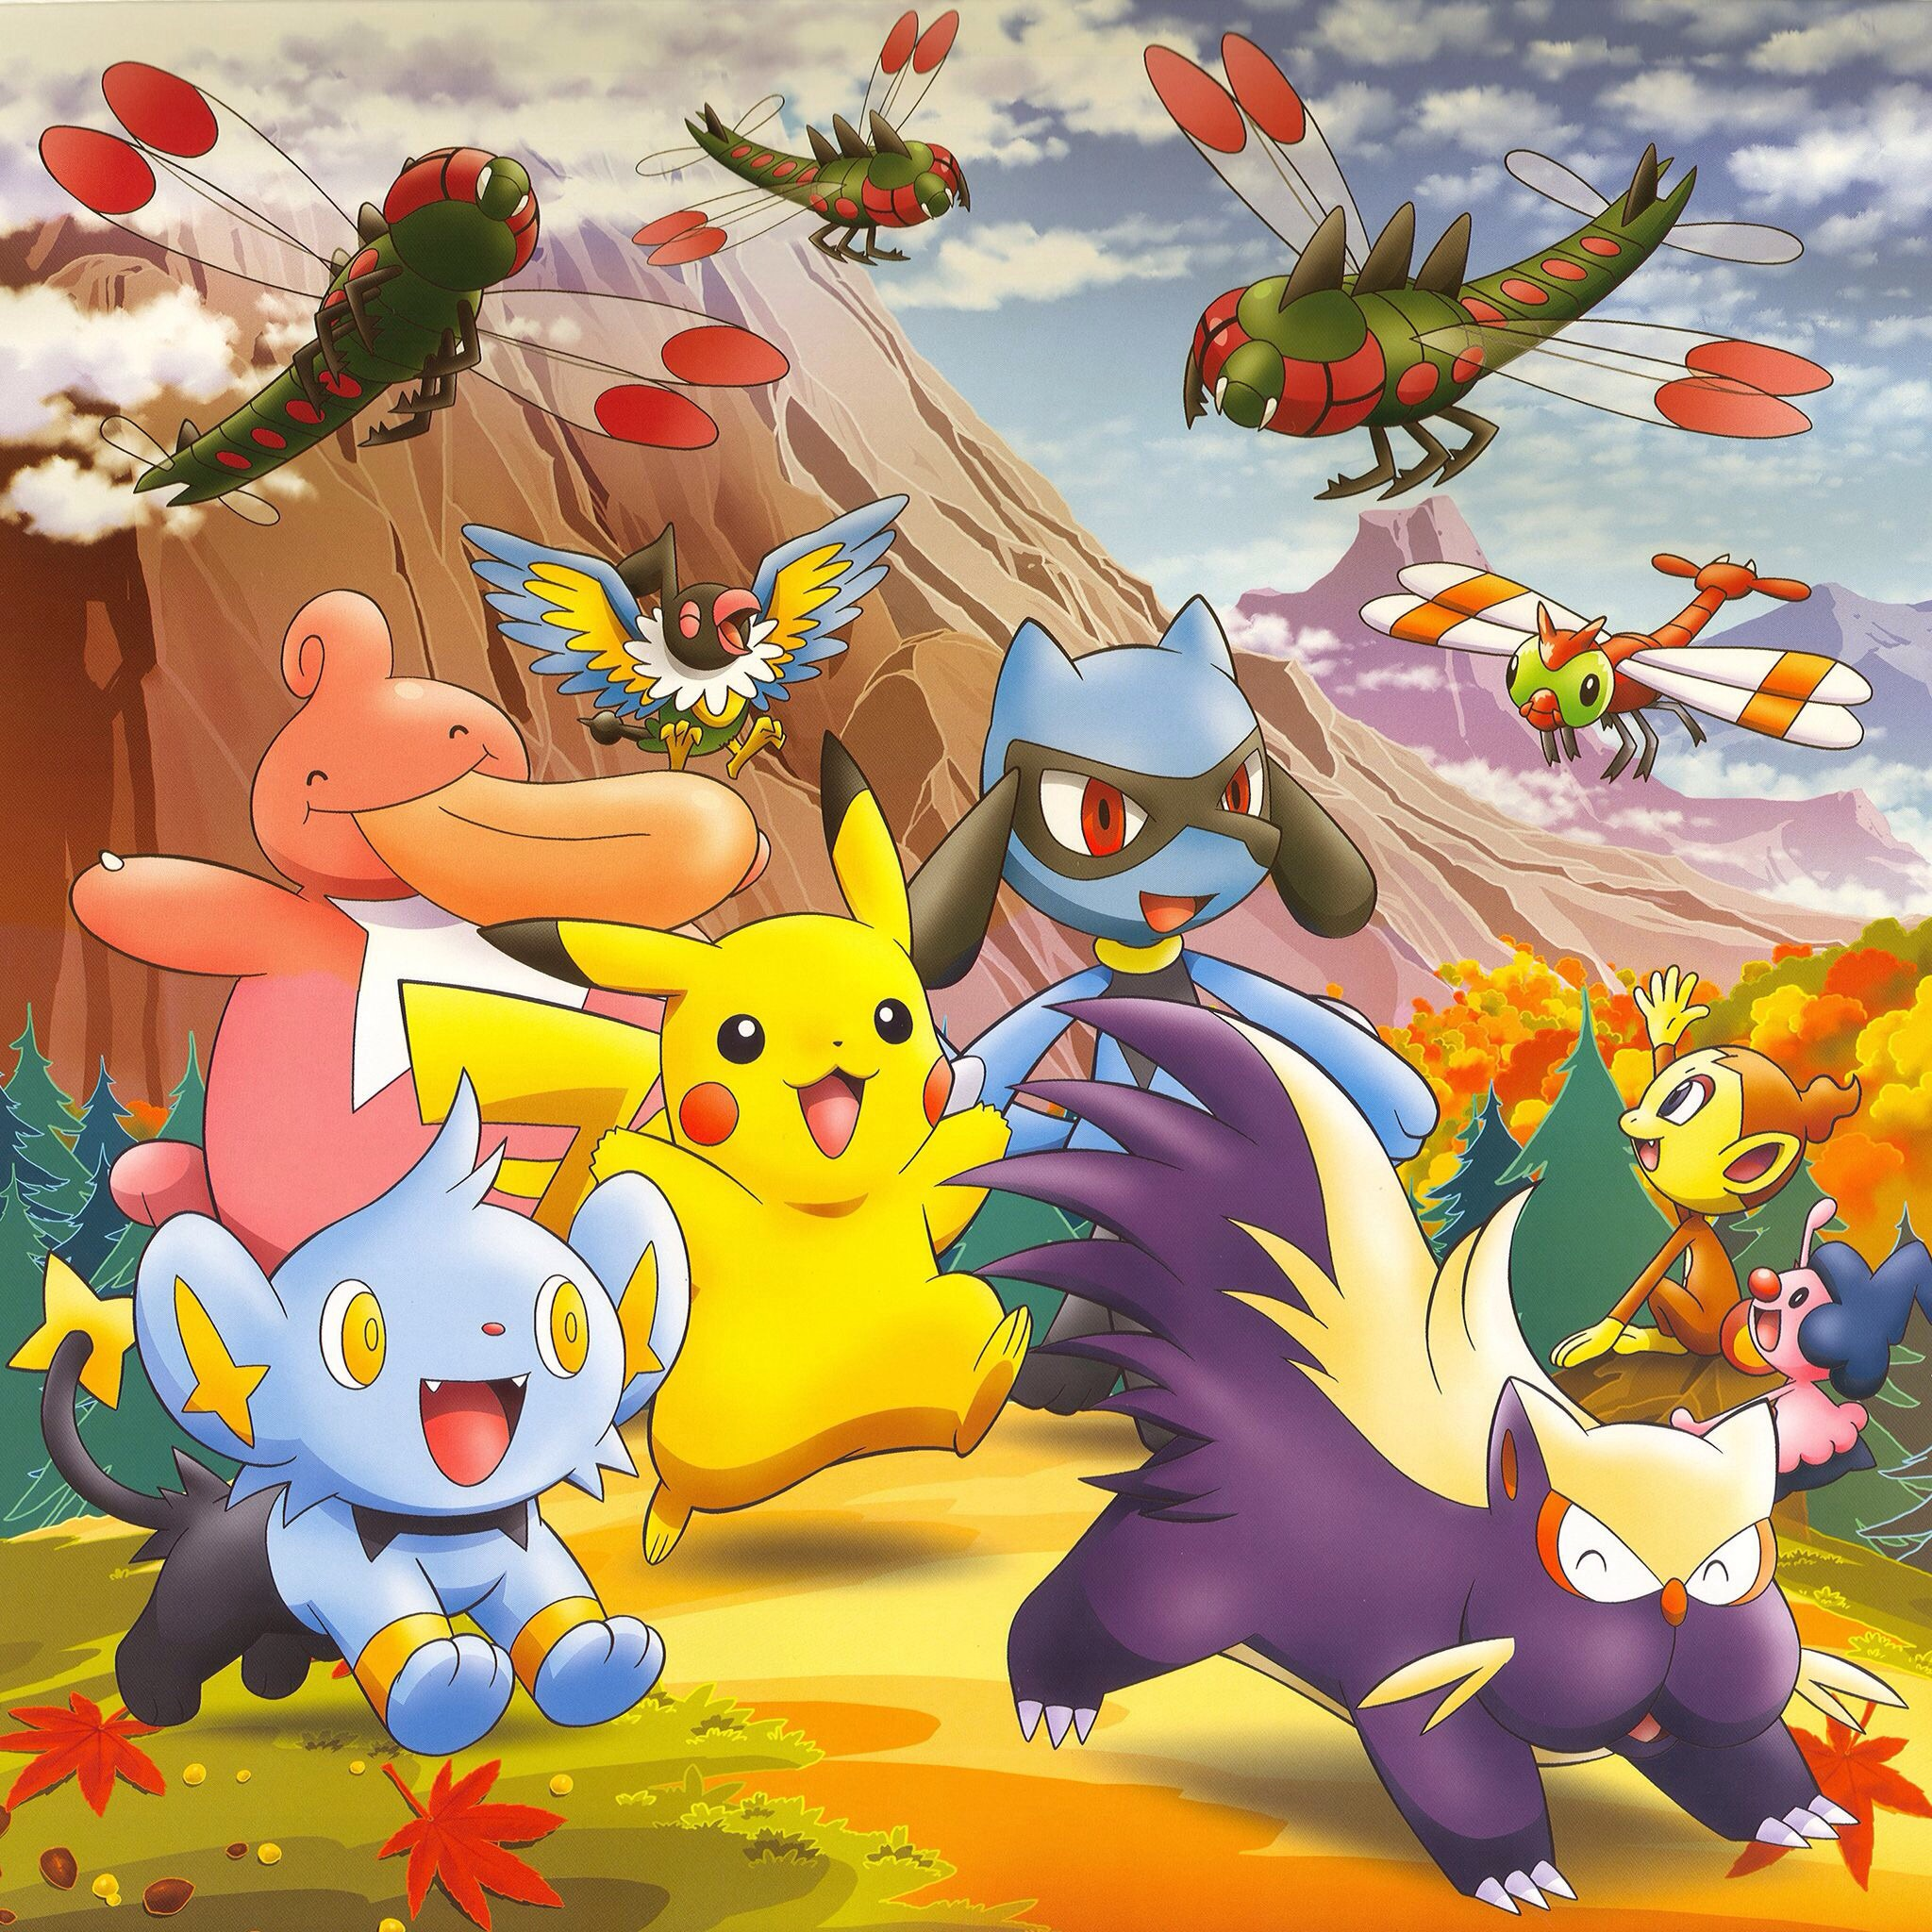 Fall Desktop Wallpaper Load Pikachu And Friends In The Fall Pok 233 Mon Photo 38336646